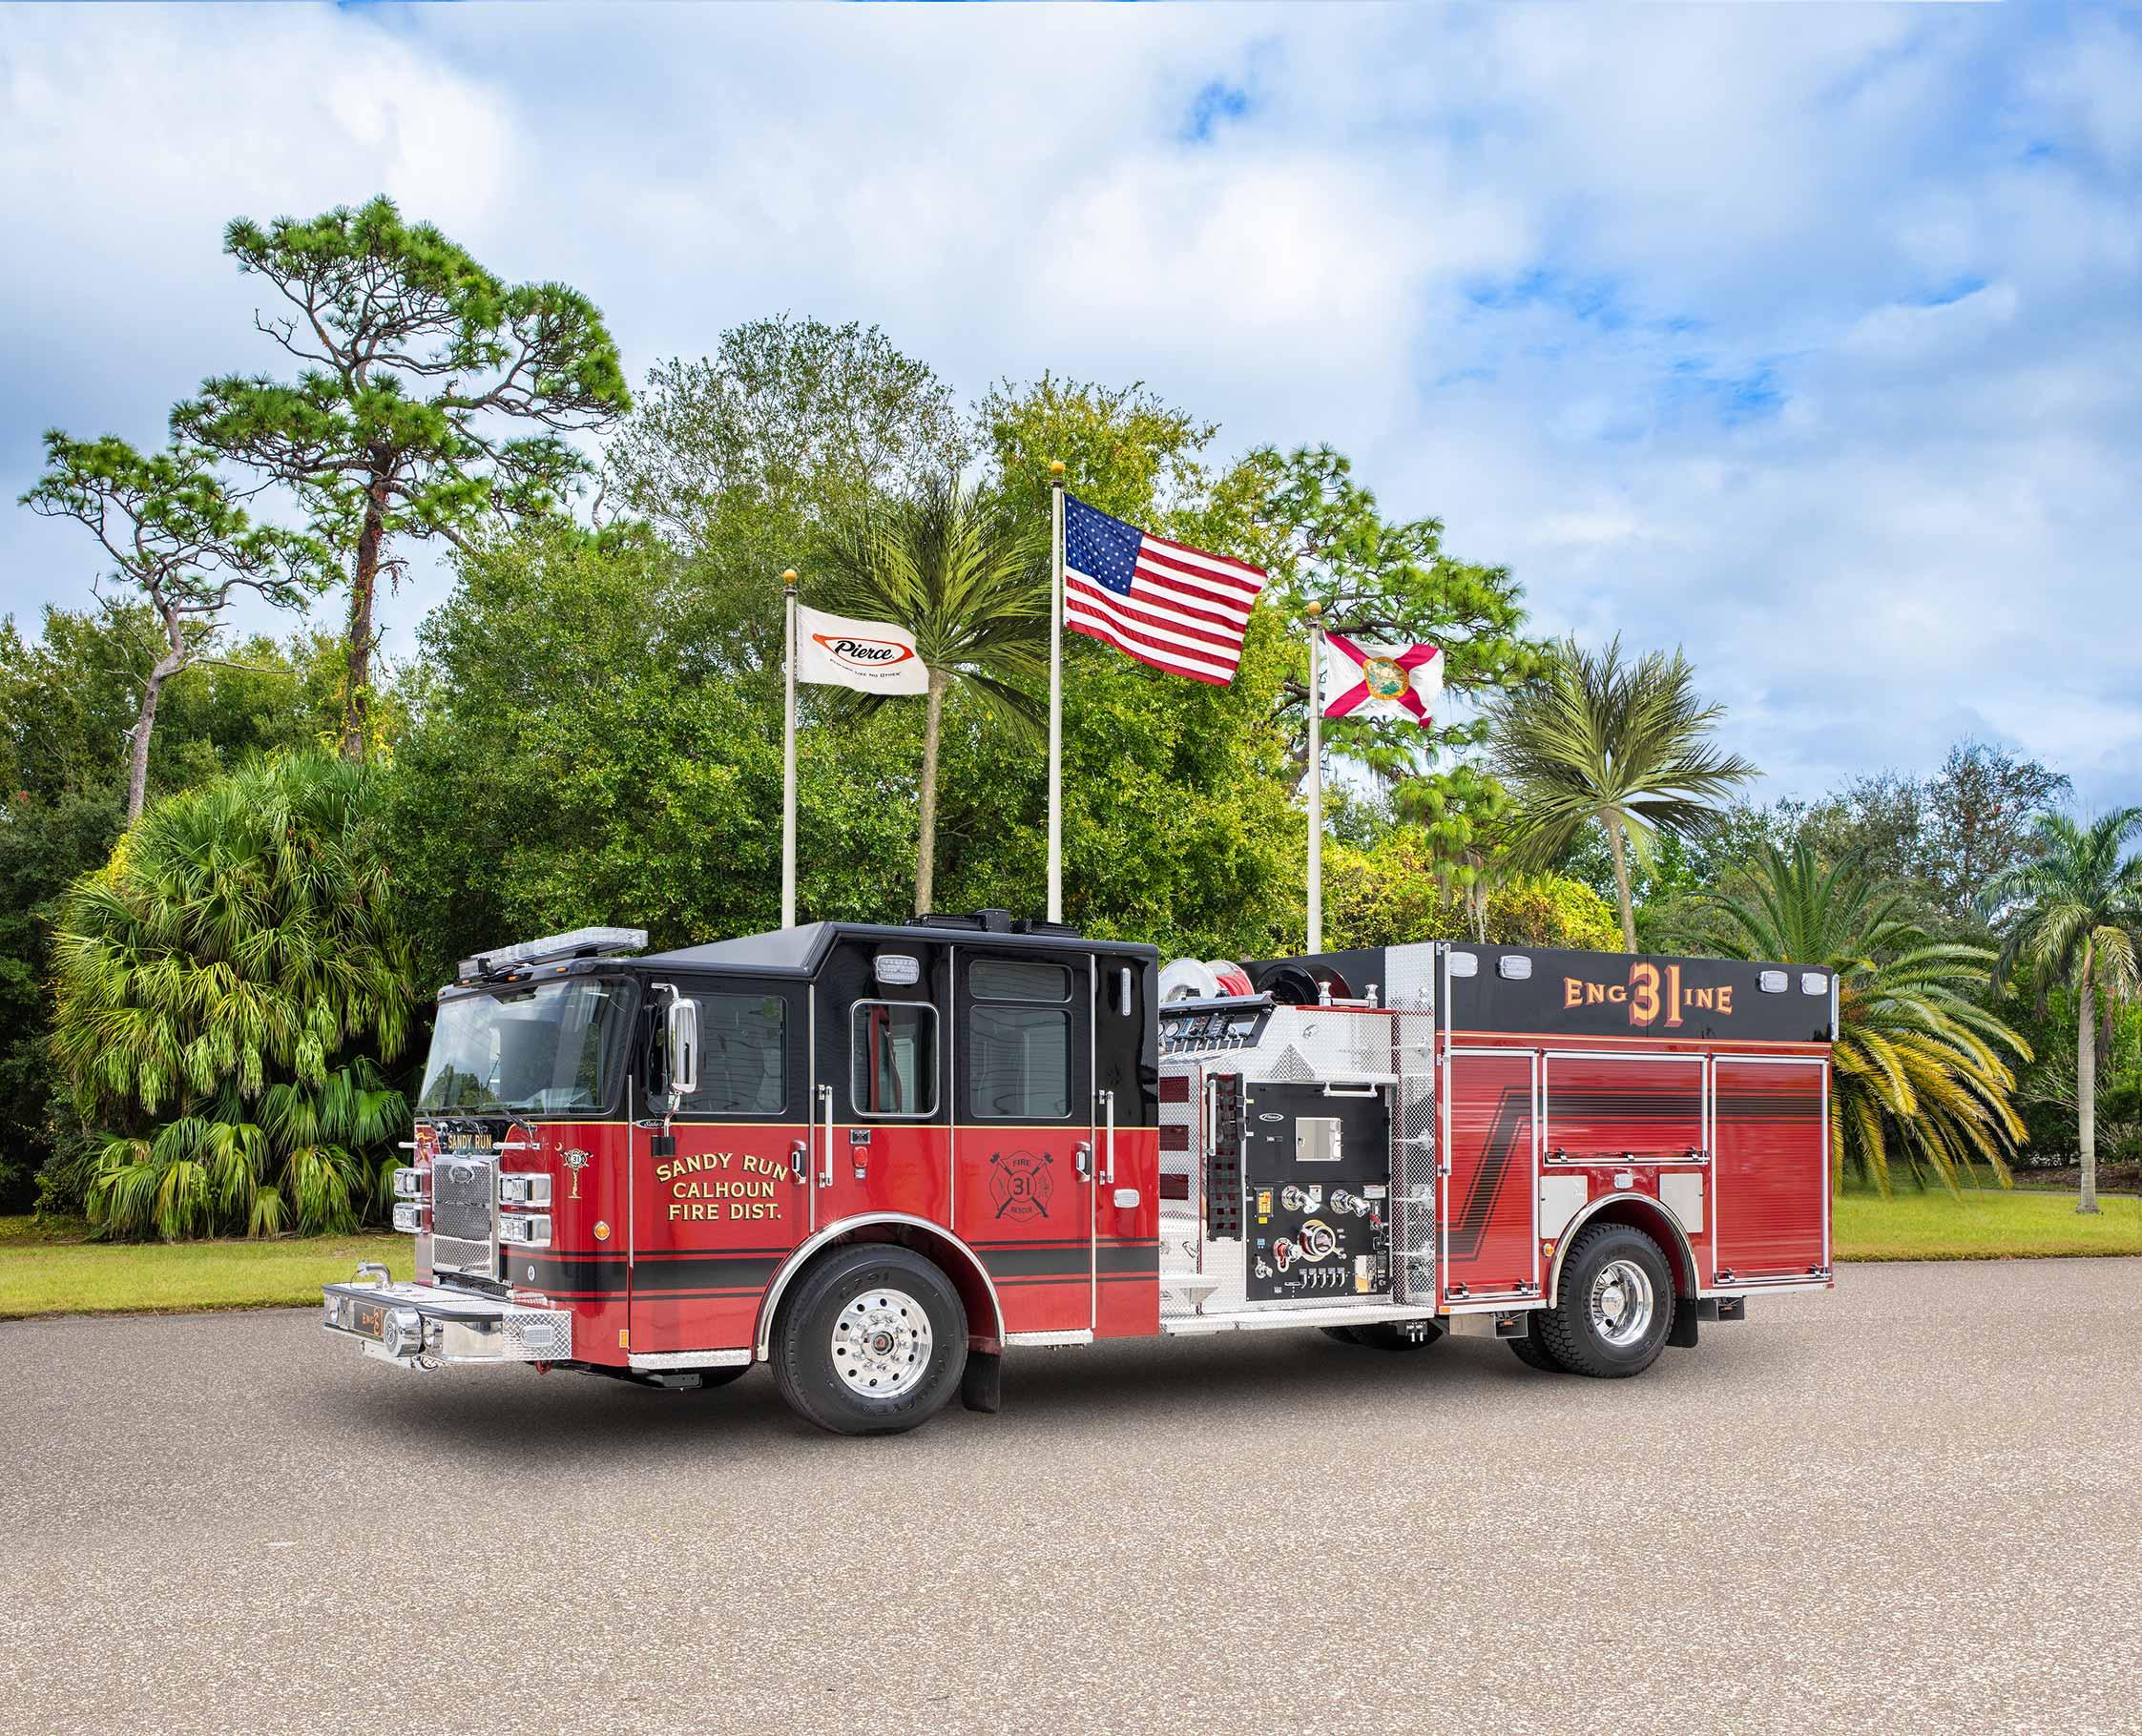 Sandy Run- Calhoun County Fire District - Pumper